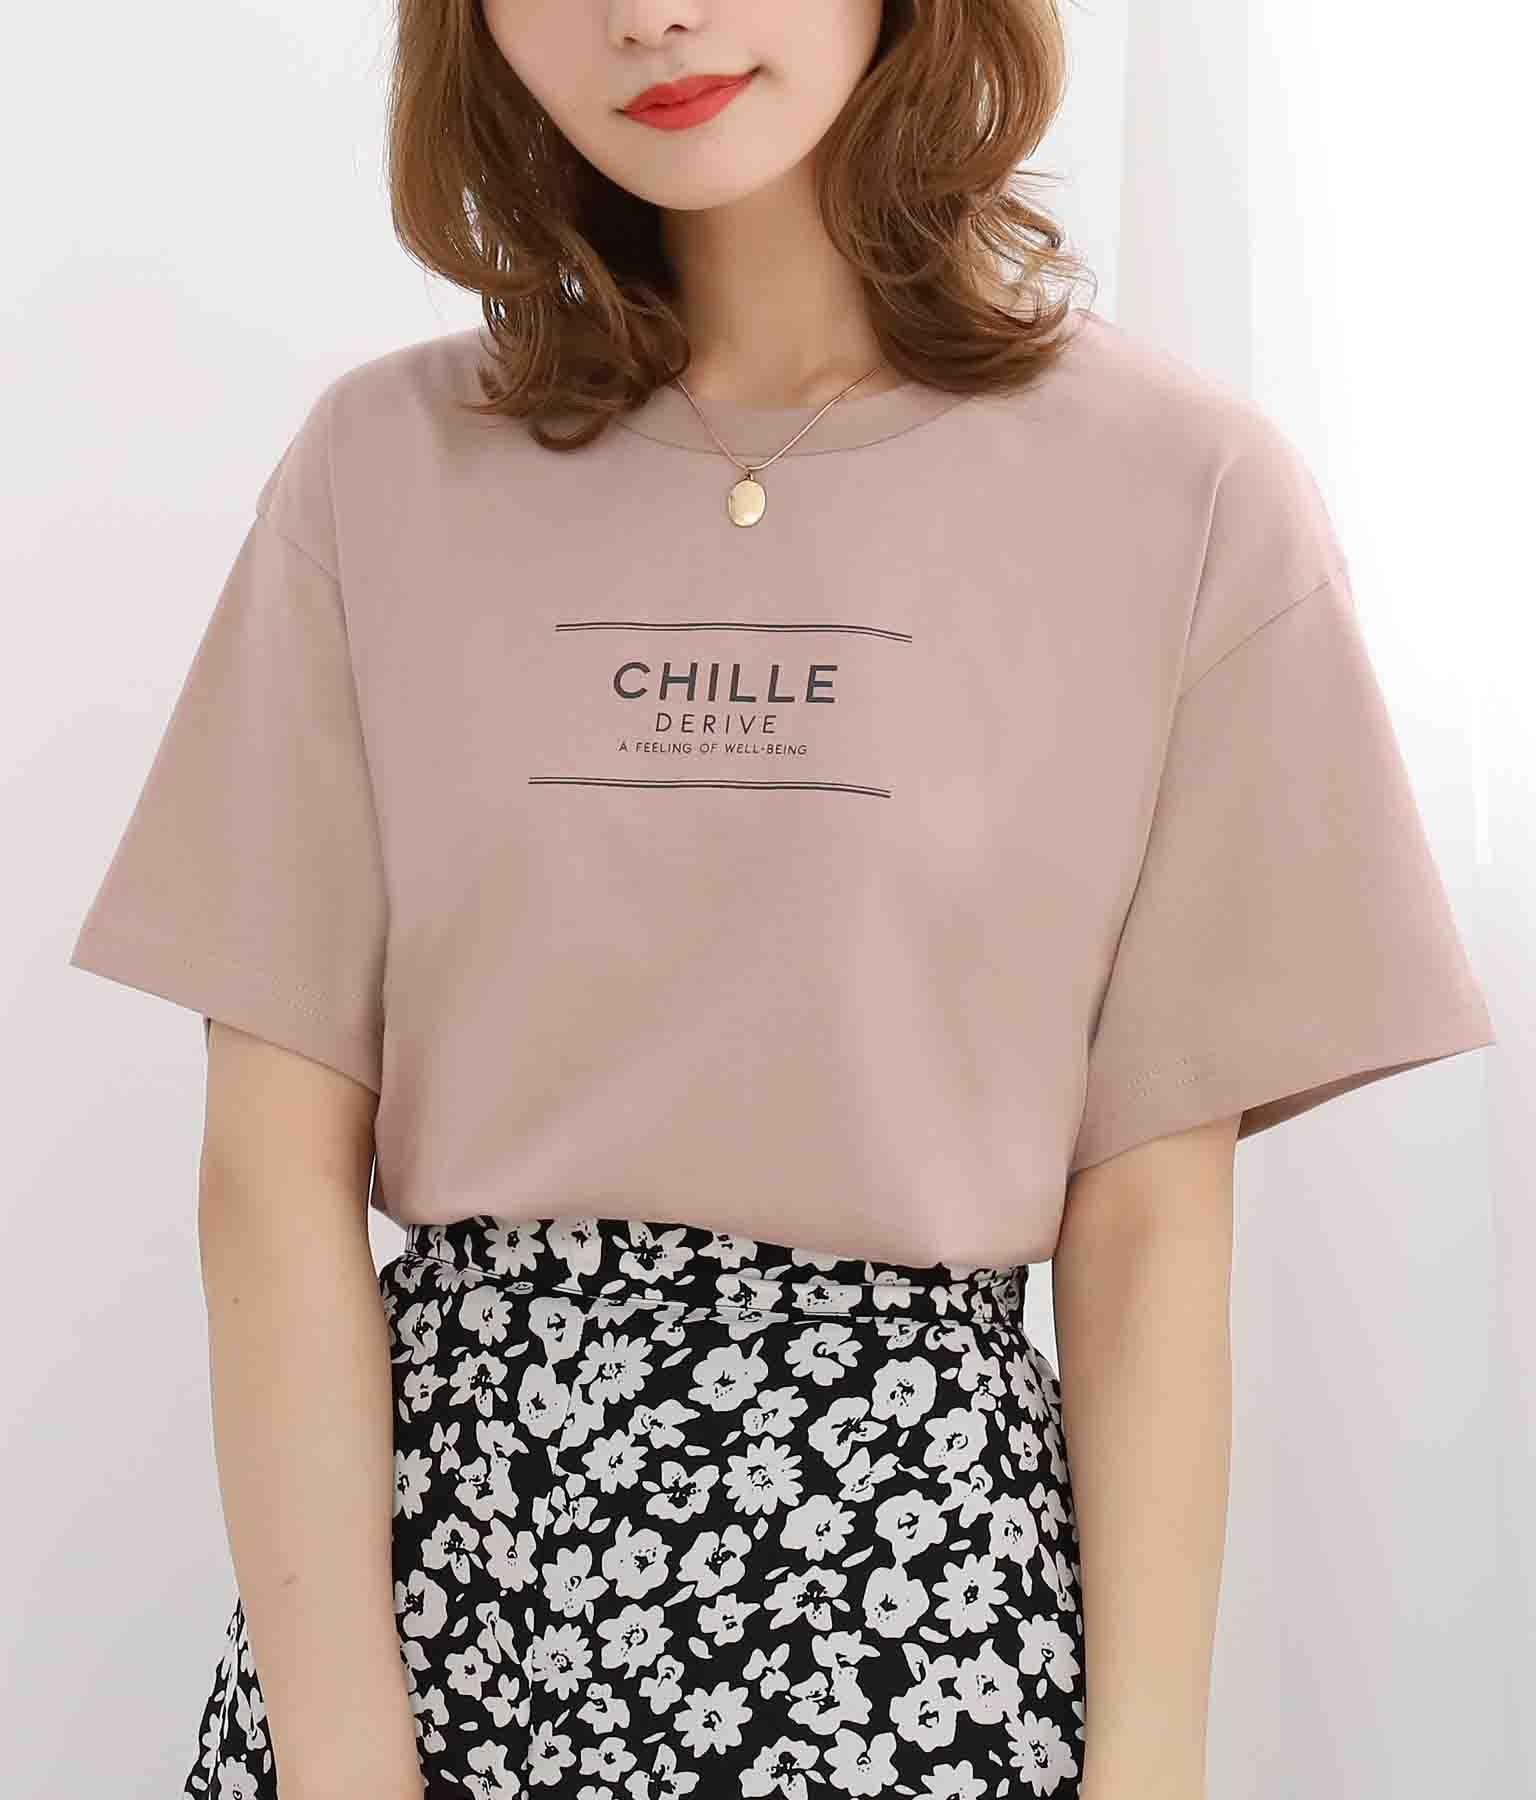 CHILLEテキストプリントTシャツ